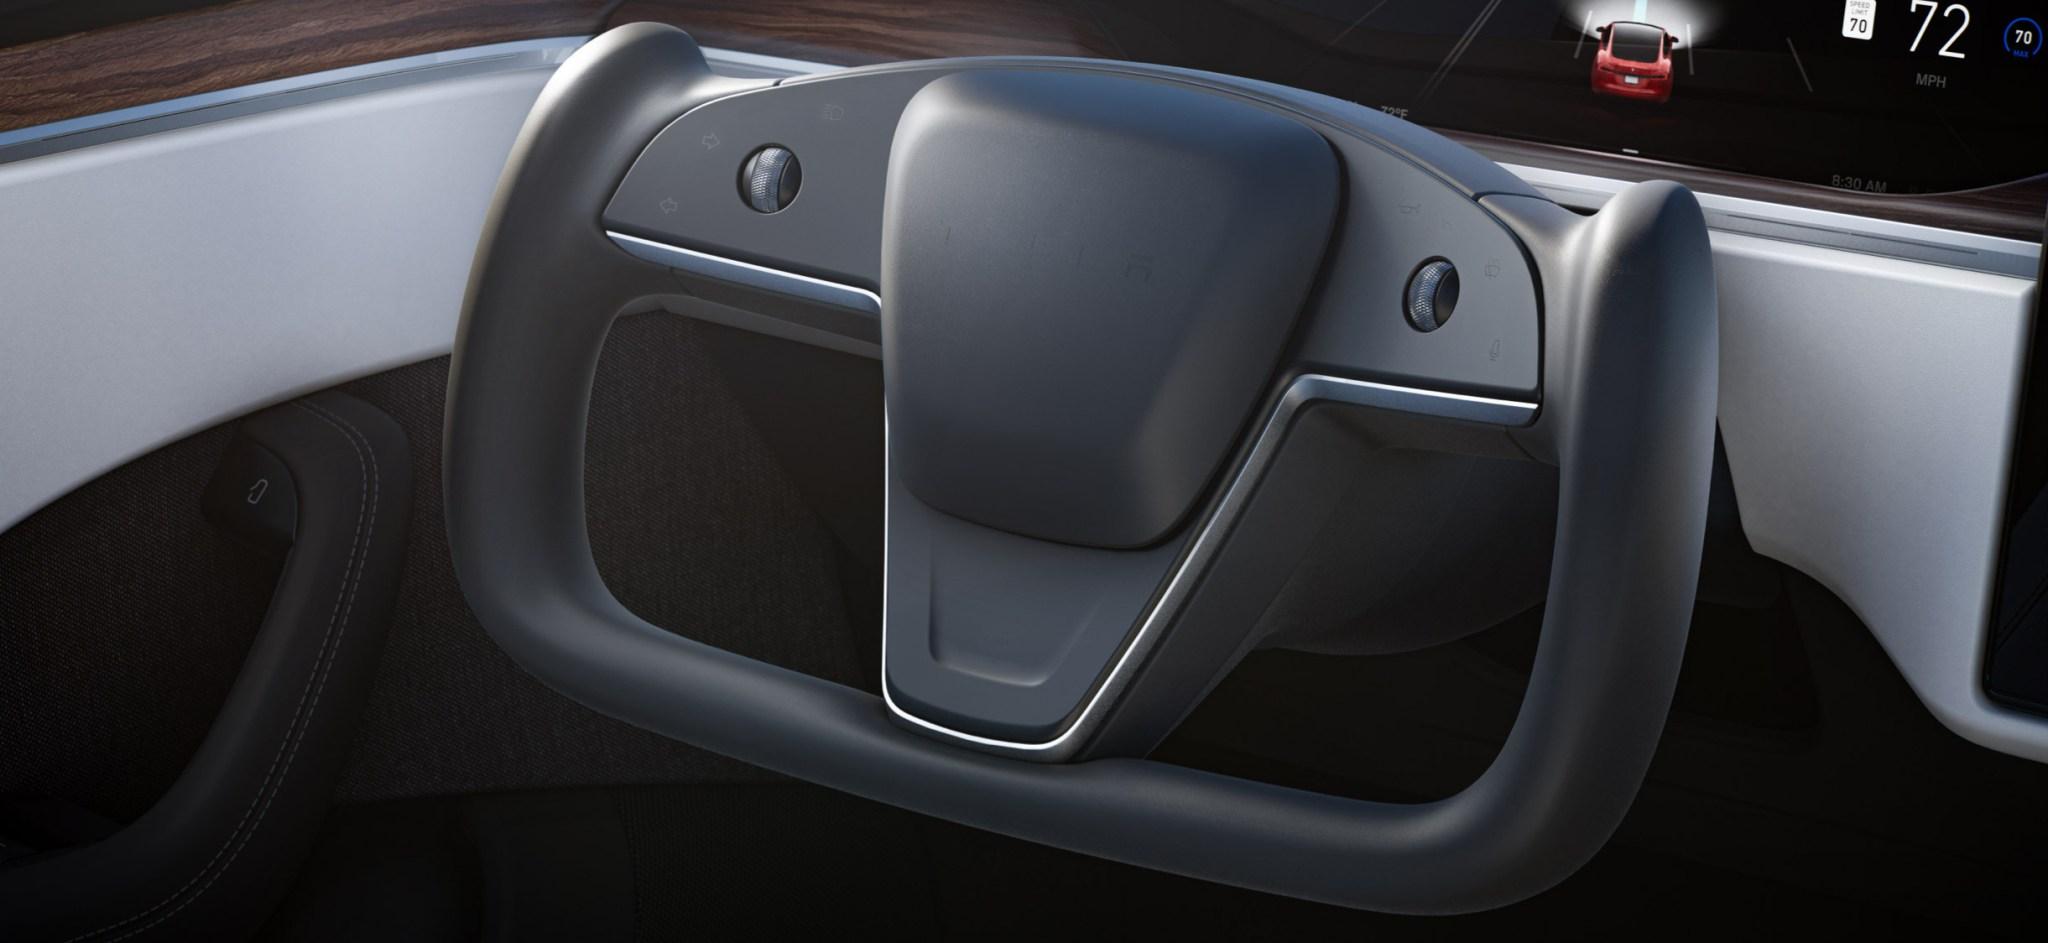 Tesla-new-Model-S-picture-steering-wheel